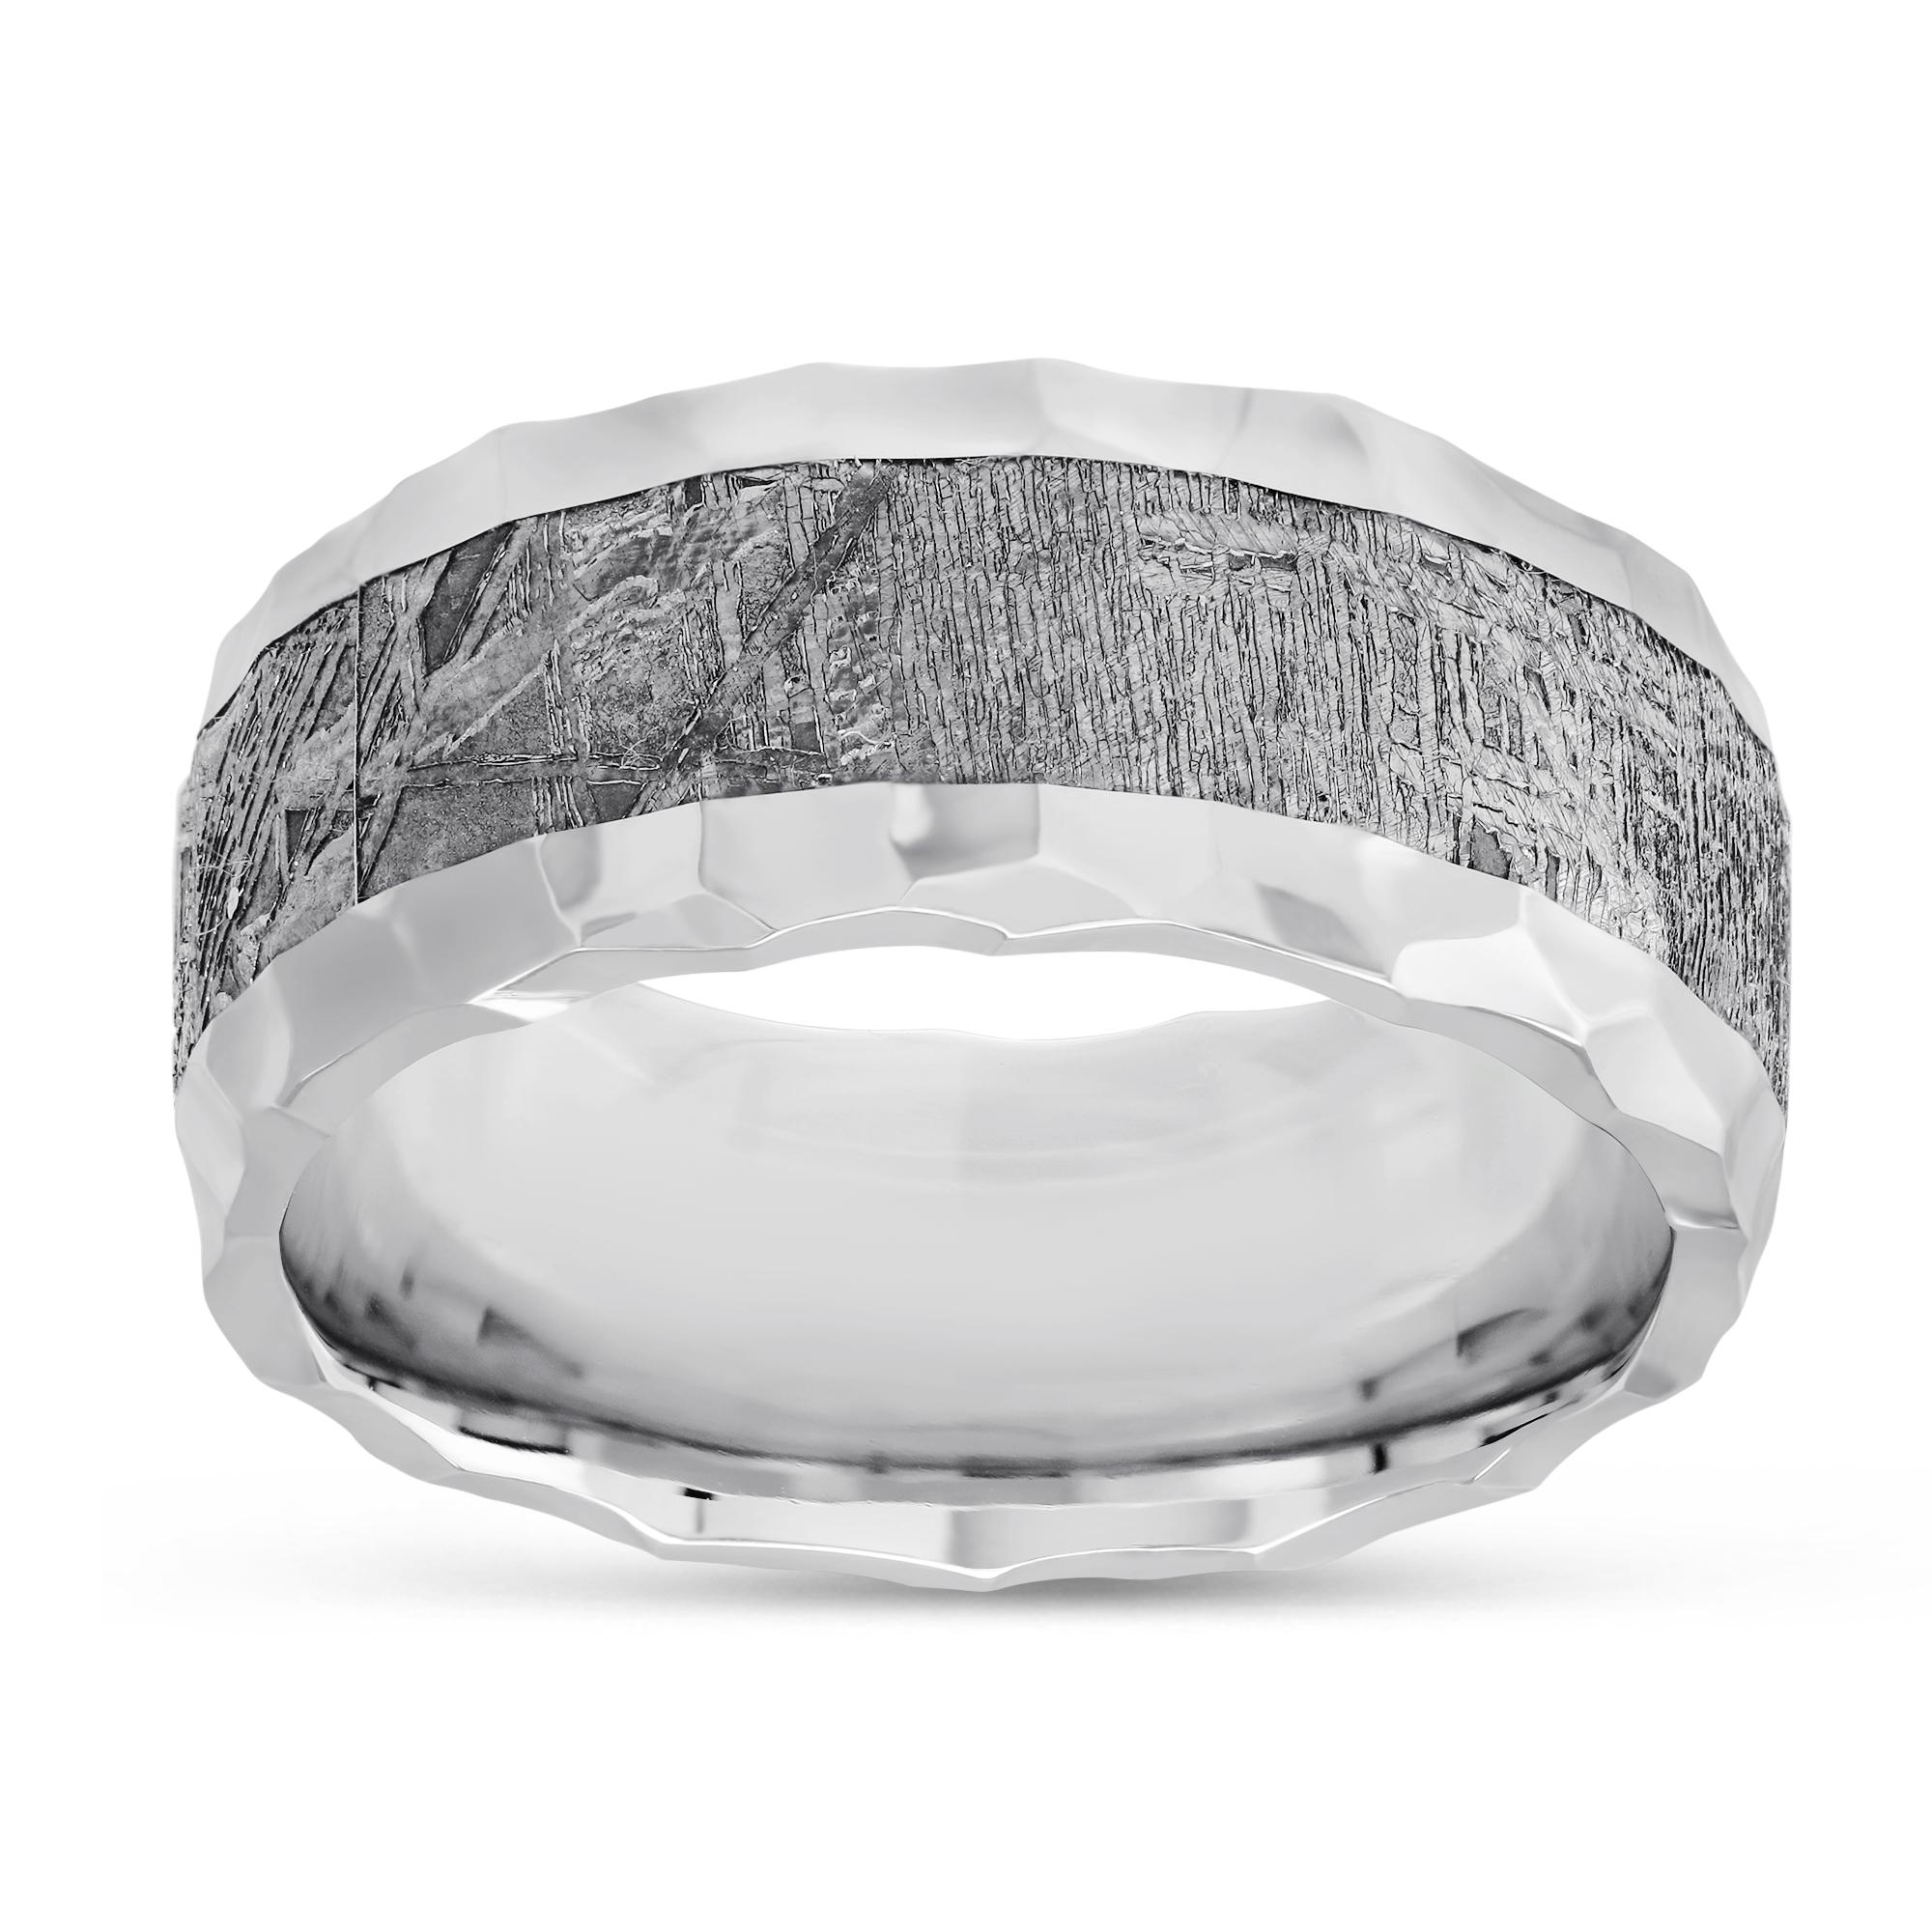 Cobalt Chrome Meteorite Wedding Band 9mm Borsheims